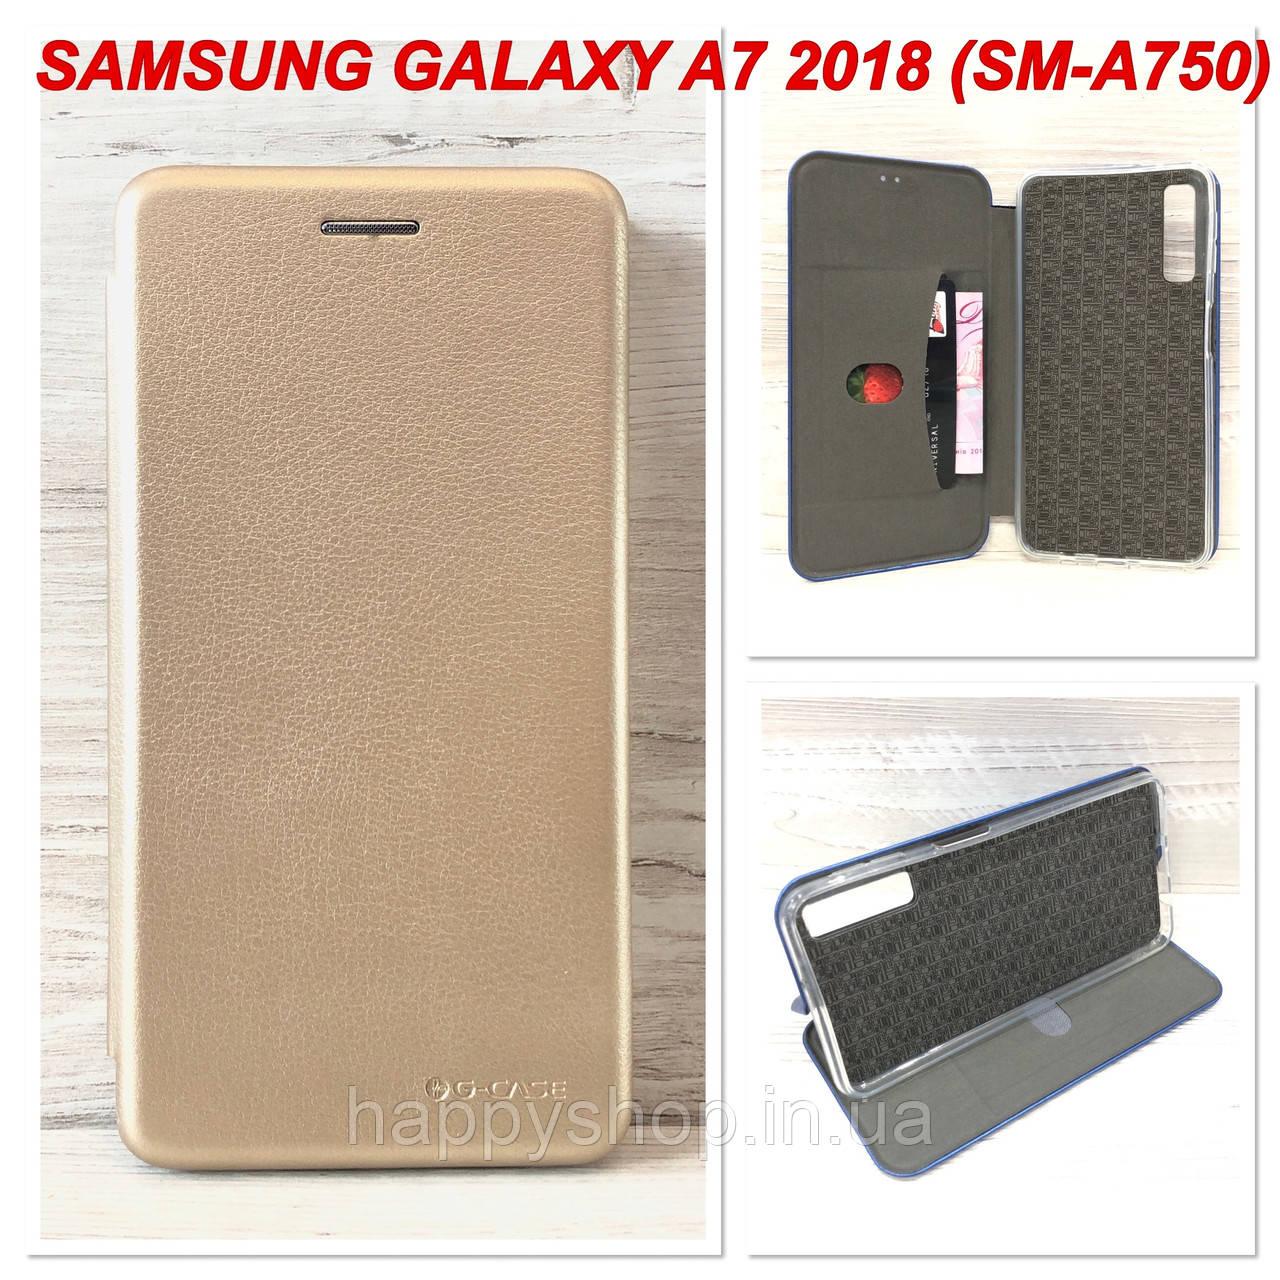 Чехол-книжка G-Case для Samsung Galaxy A7 2018 (A750) Золотистый